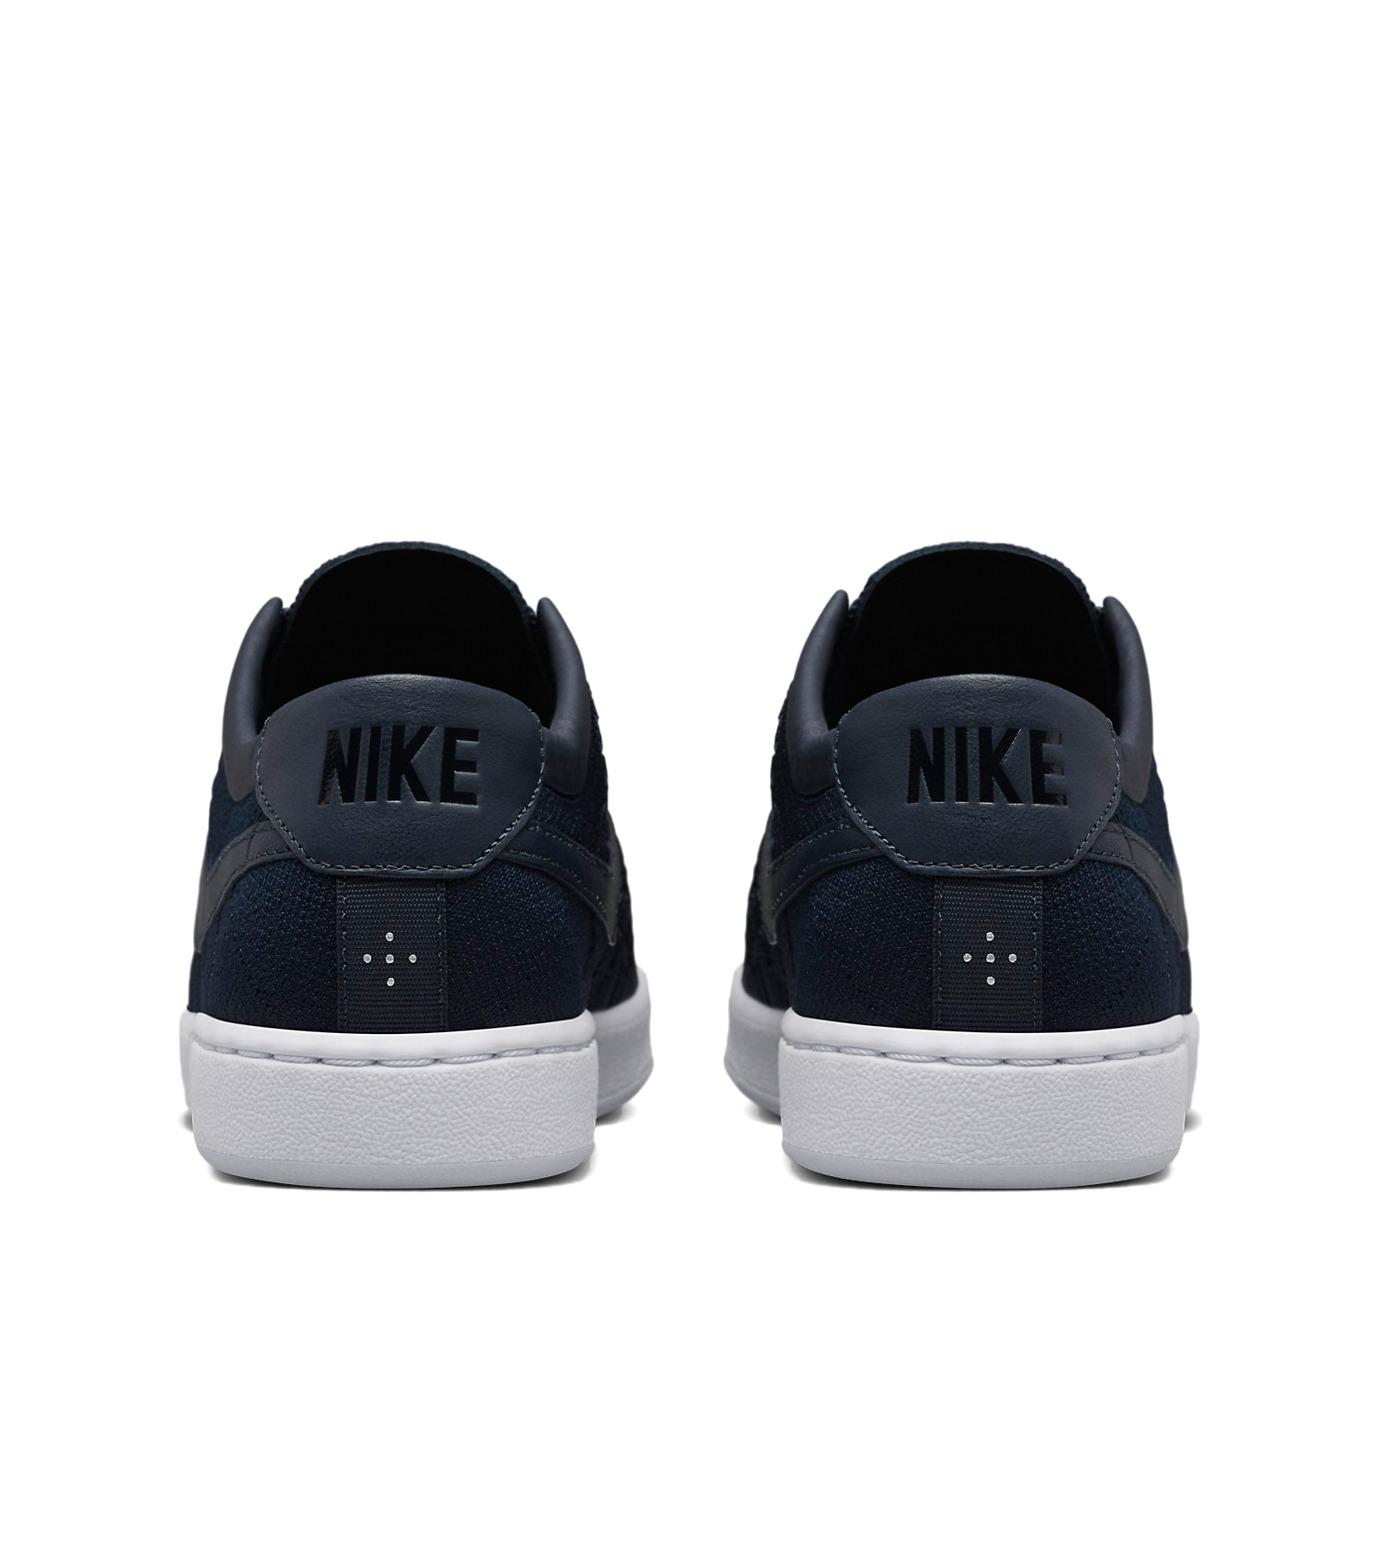 NIKE(ナイキ)のCOURT TENNIS CLASSIC ULTRA FLYKNIT X RF-NAVY(シューズ/shoes)-836360-401-93 拡大詳細画像5